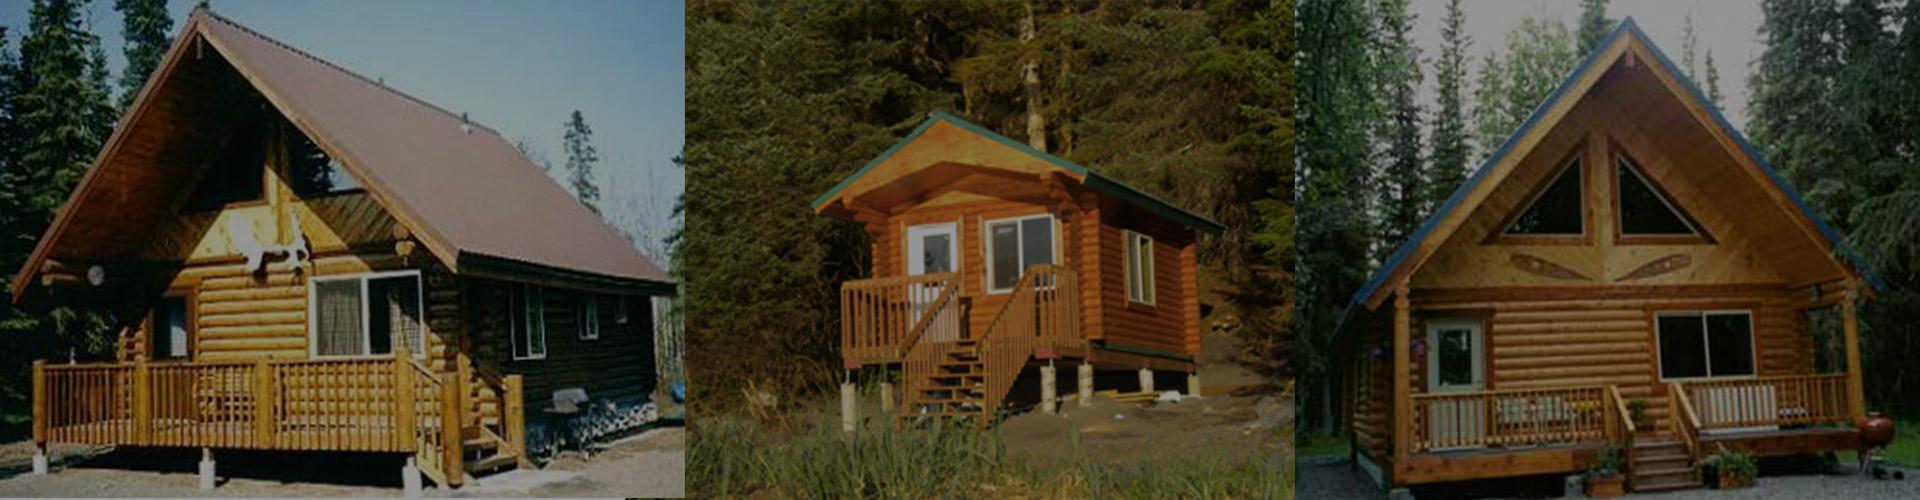 alaskan made superior logs log homes log kits log cabins pre rh superiorlogs com log cabin homes in fairbanks alaska log cabin kit homes alaska